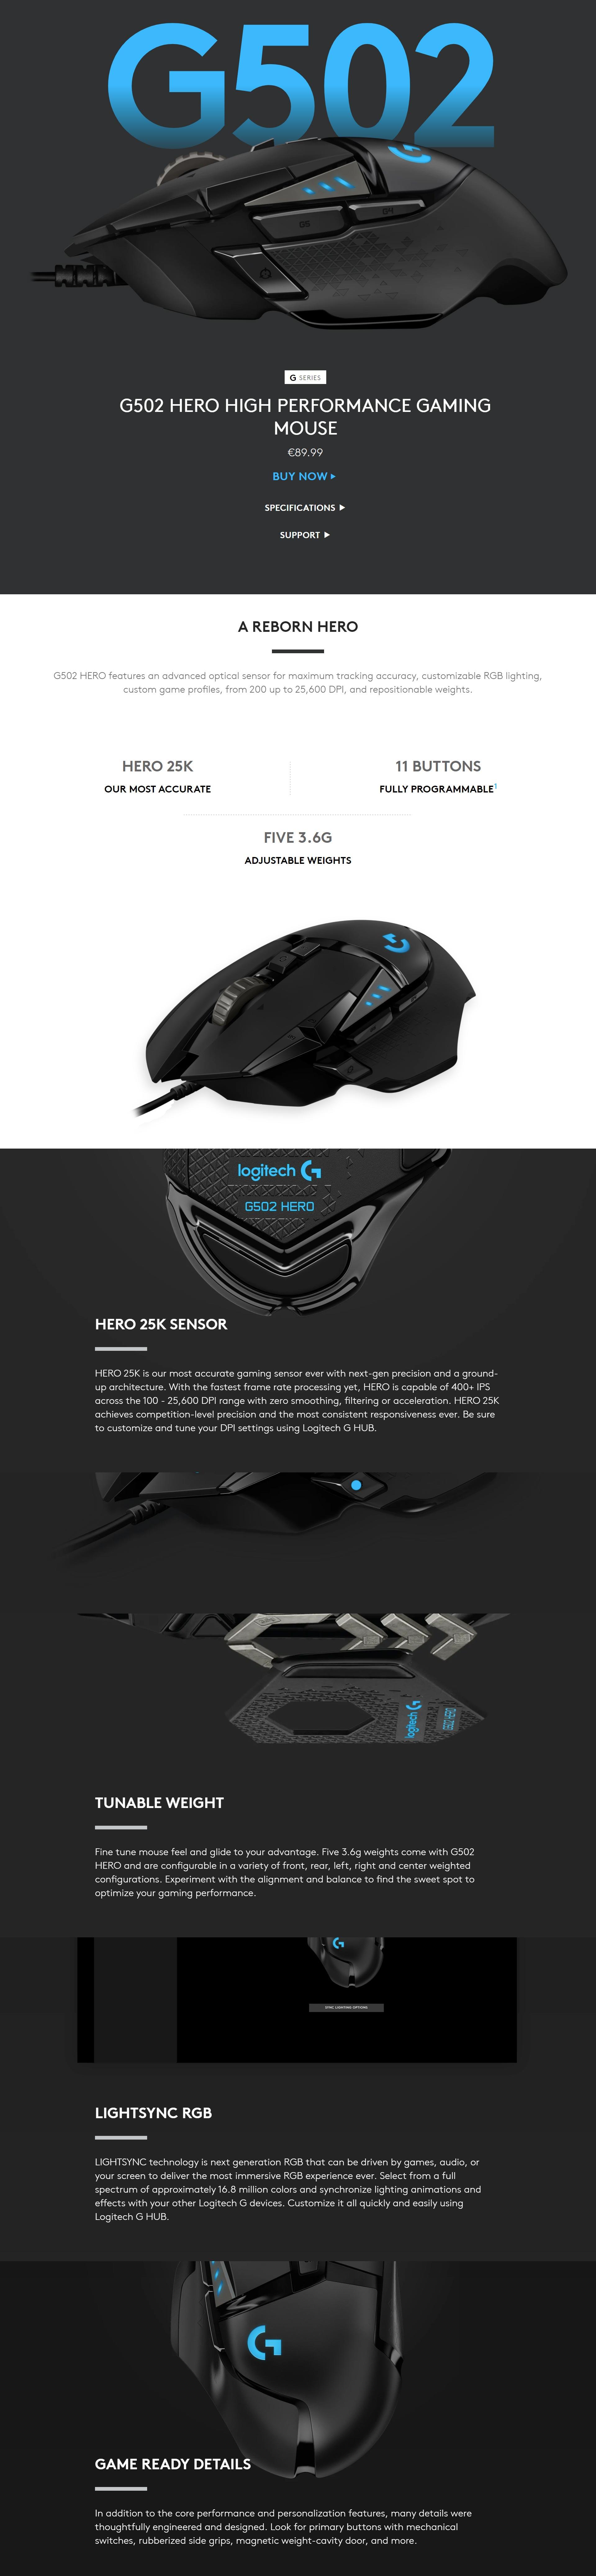 screencapture-logitechg-en-eu-products-gaming-mice-g502-hero-gaming-mouse-910-005470-html-2021-09-28-11_46_57.jpg